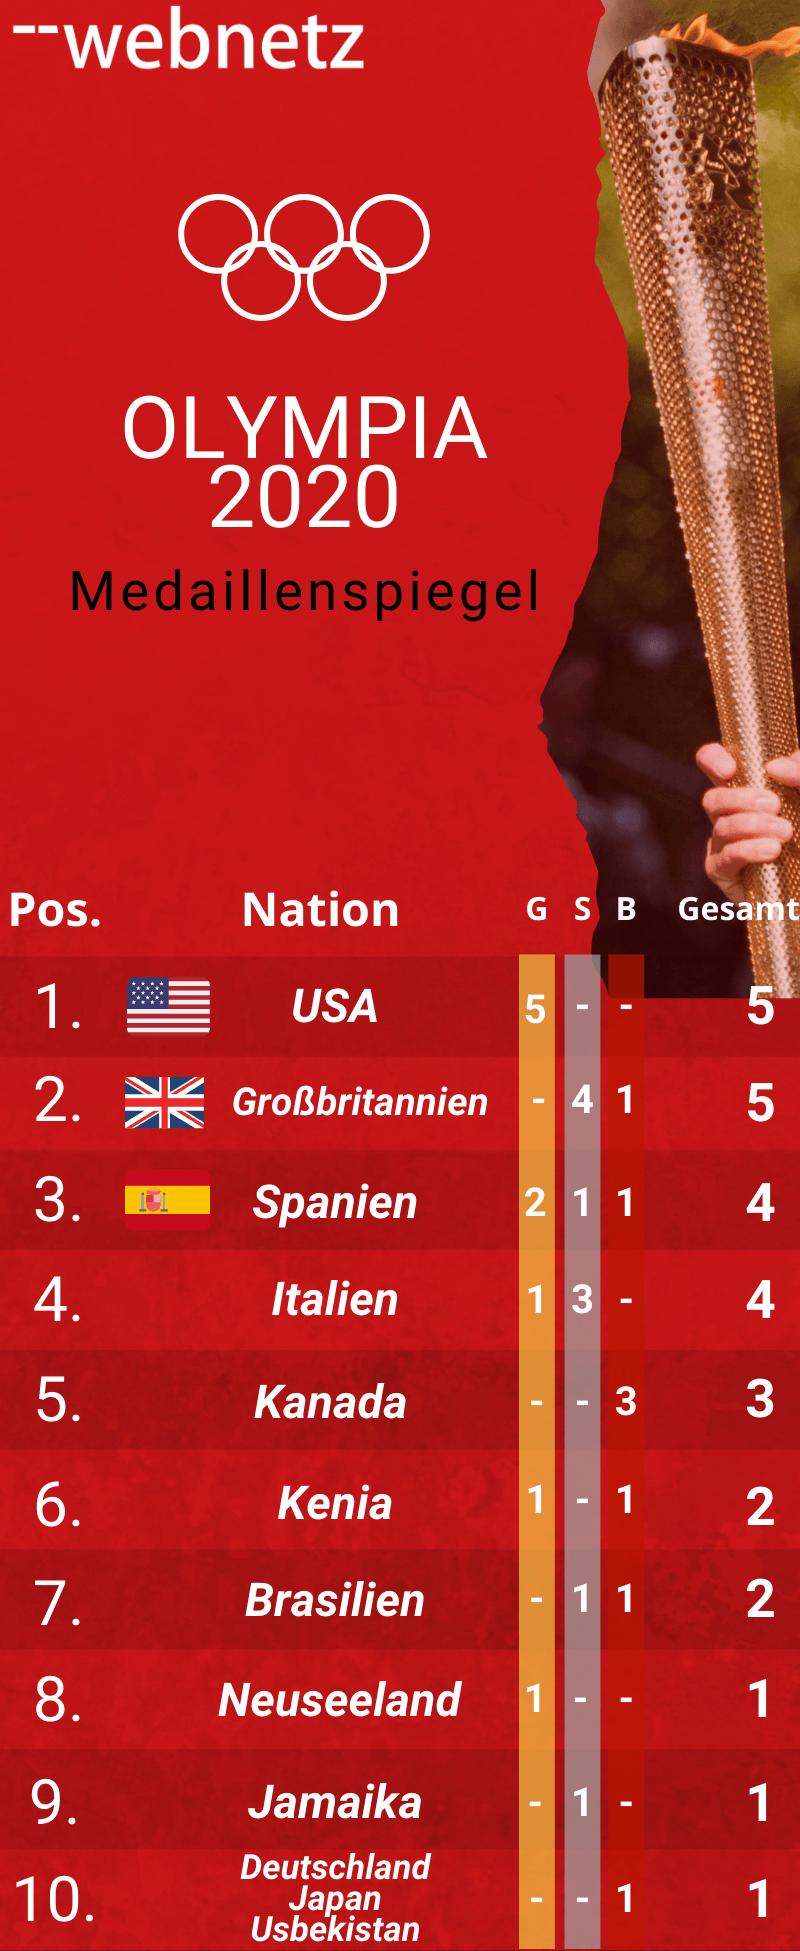 Social Media Follower der einzelnen Nationen bei Olympia